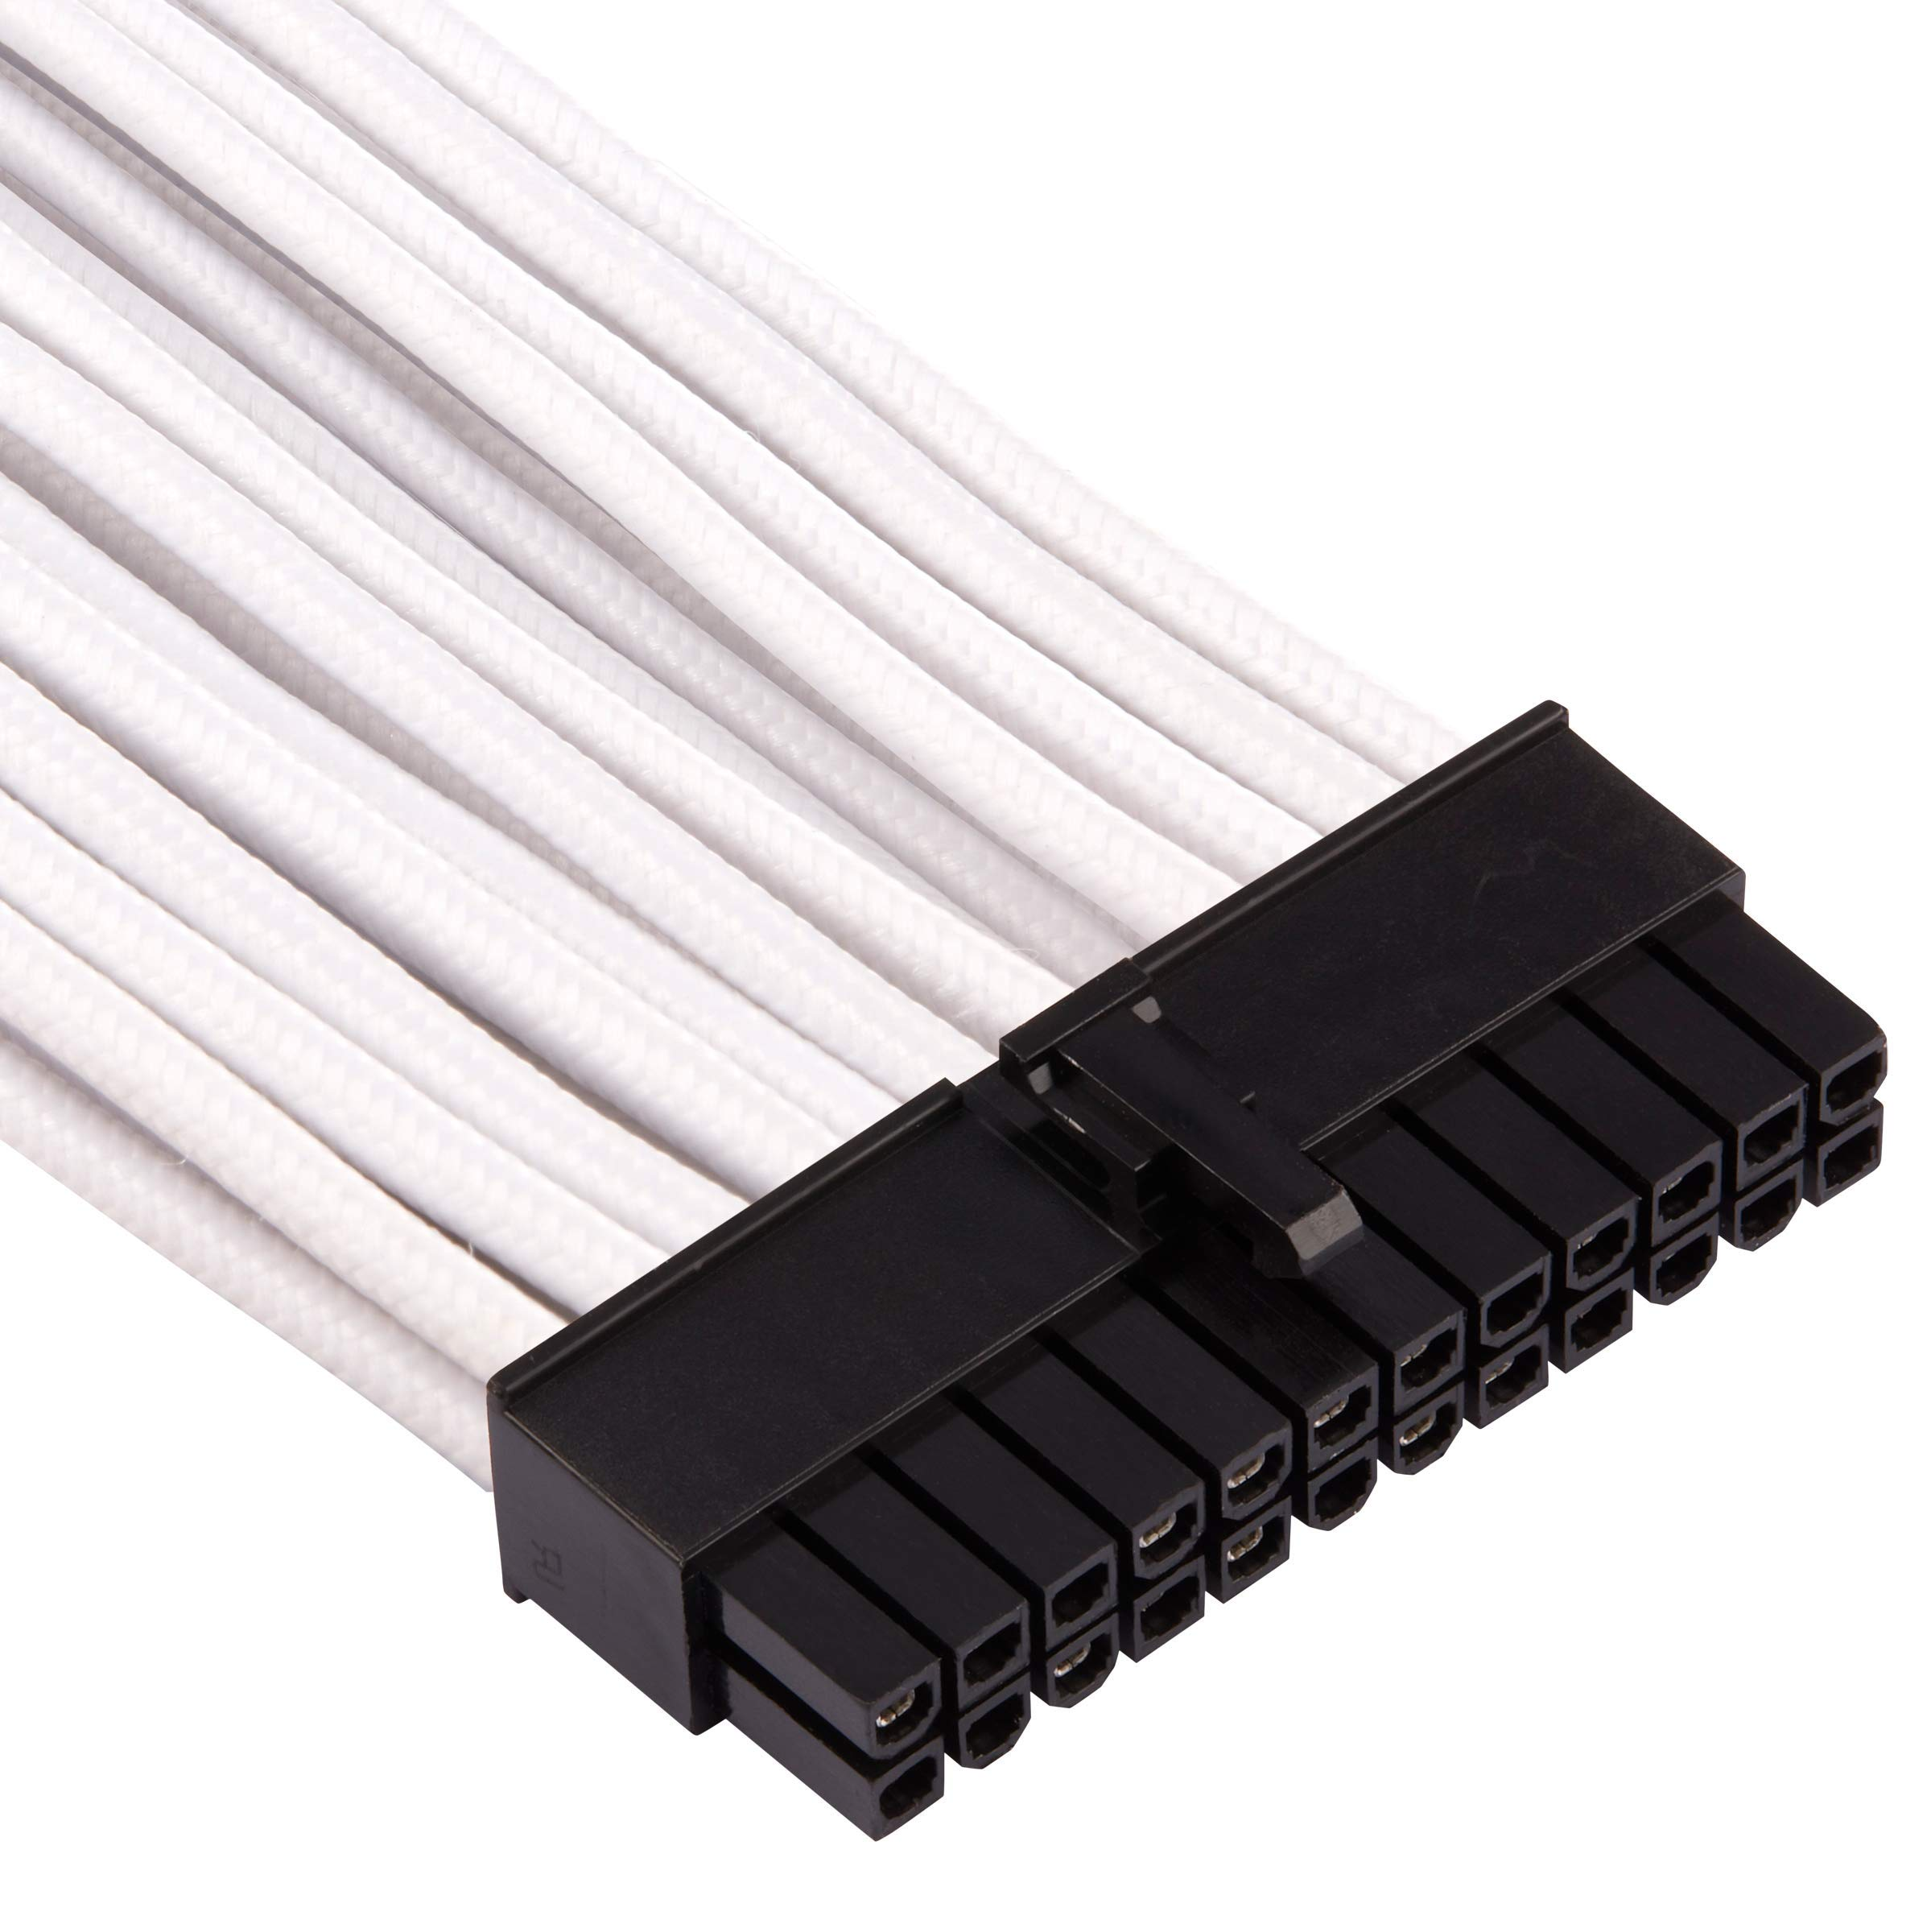 CORSAIR Premium Individually Sleeved PSU Cables Starter Kit - Black, 2 Yr Warranty, for Corsair PSUs by Corsair (Image #4)